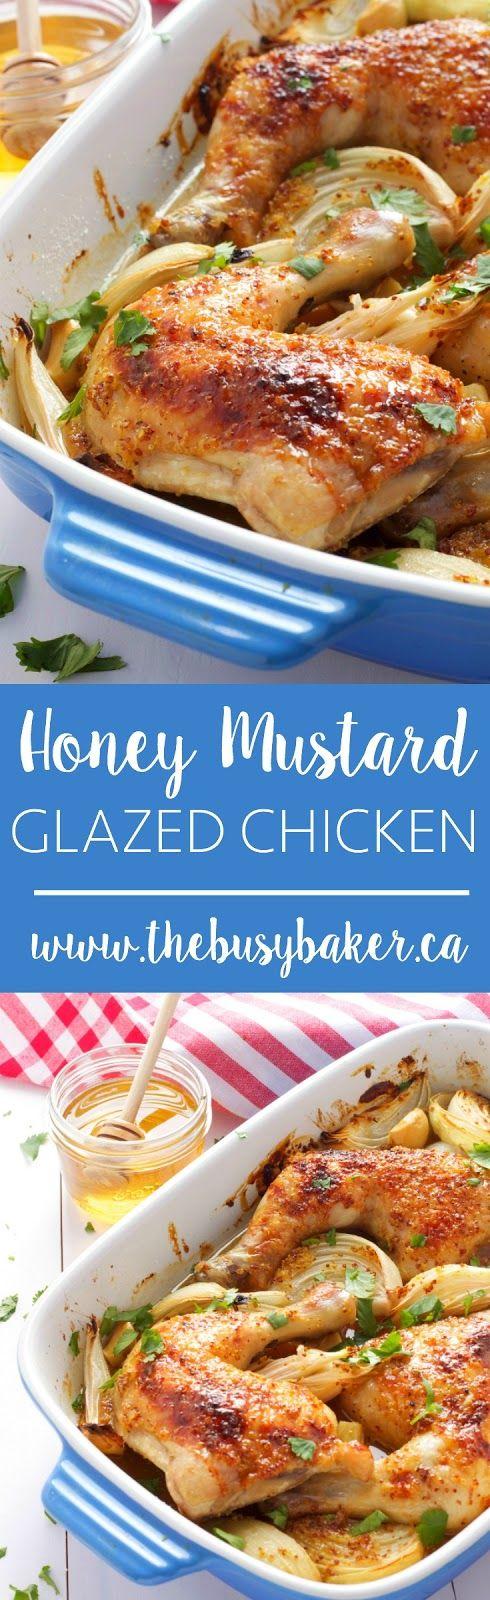 Honey Mustard Glazed Chicken www.thebusybaker.ca